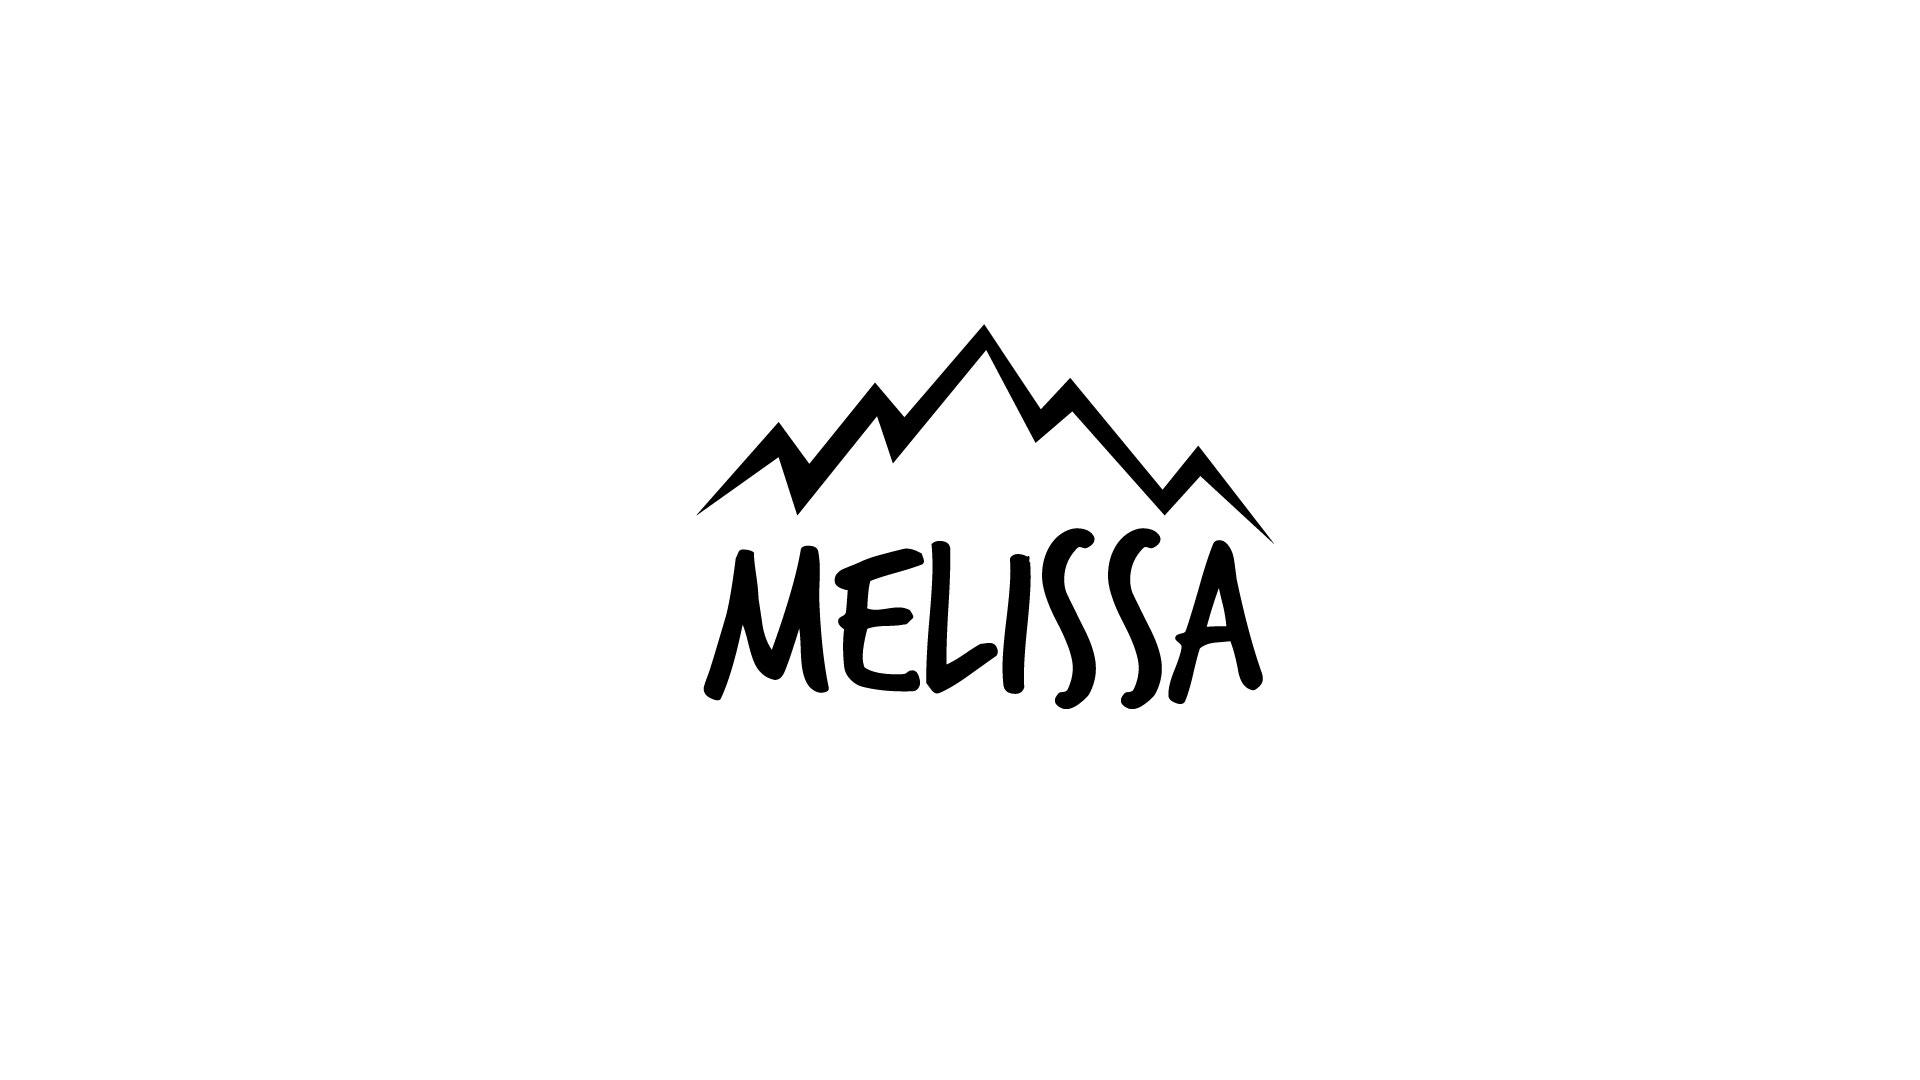 melissa_rogo_Bb